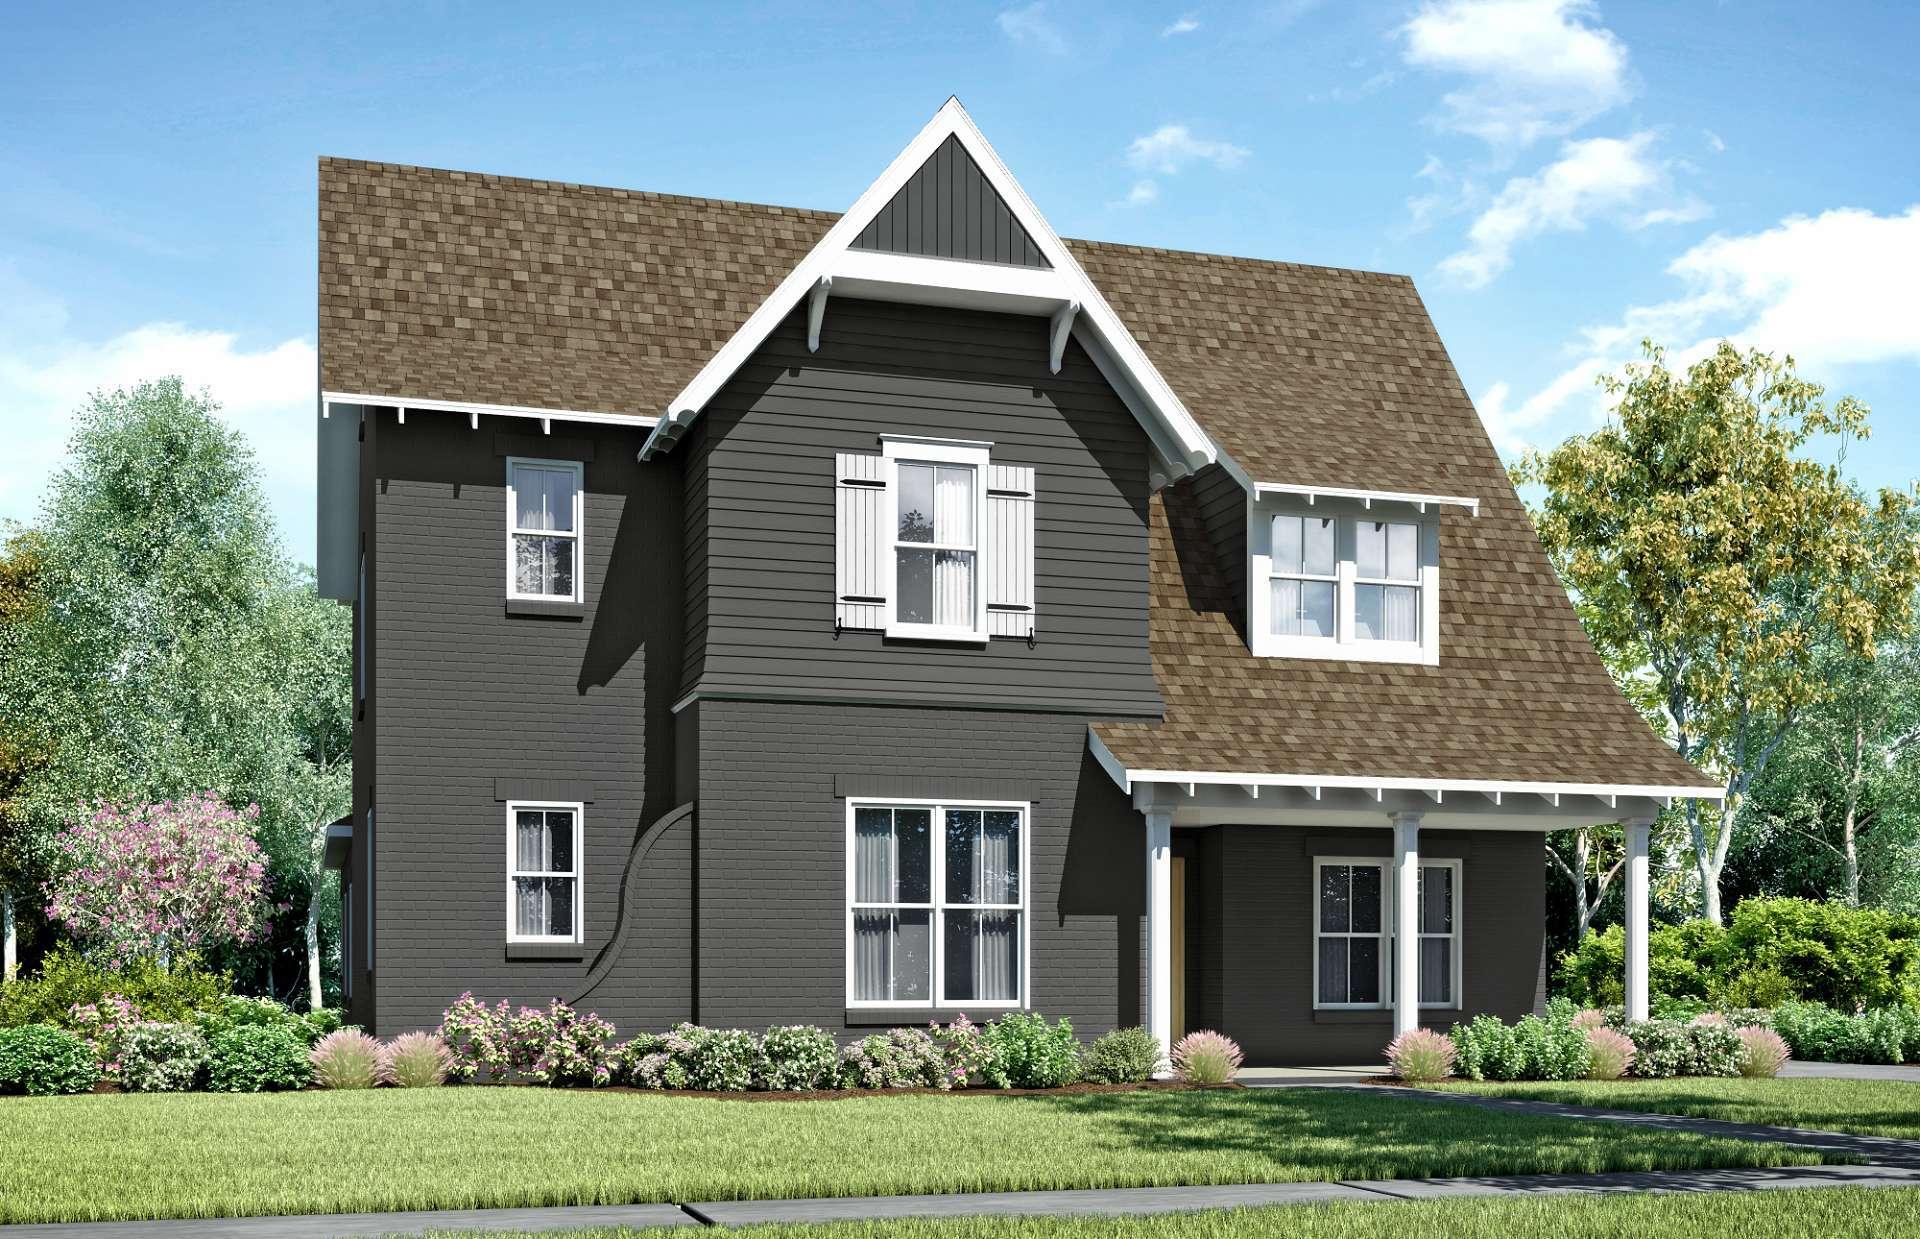 Harris homes birmingham alabama homemade ftempo for Home builders in birmingham al